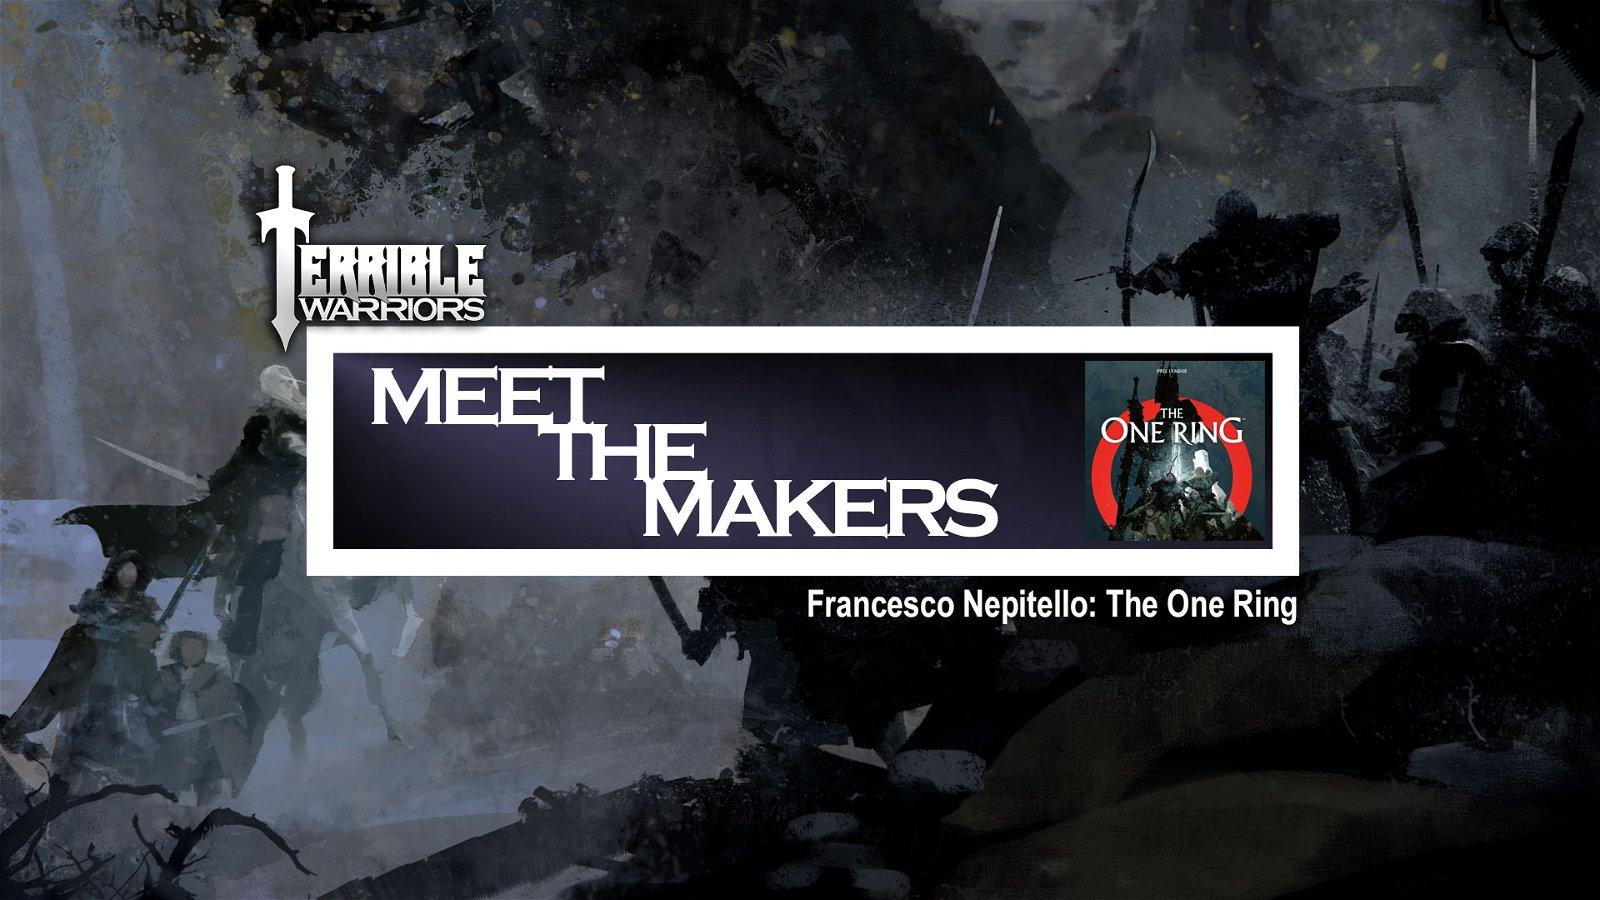 Terrible Warriors - Meet The Makers: Francesco Nepitello (The One Ring)